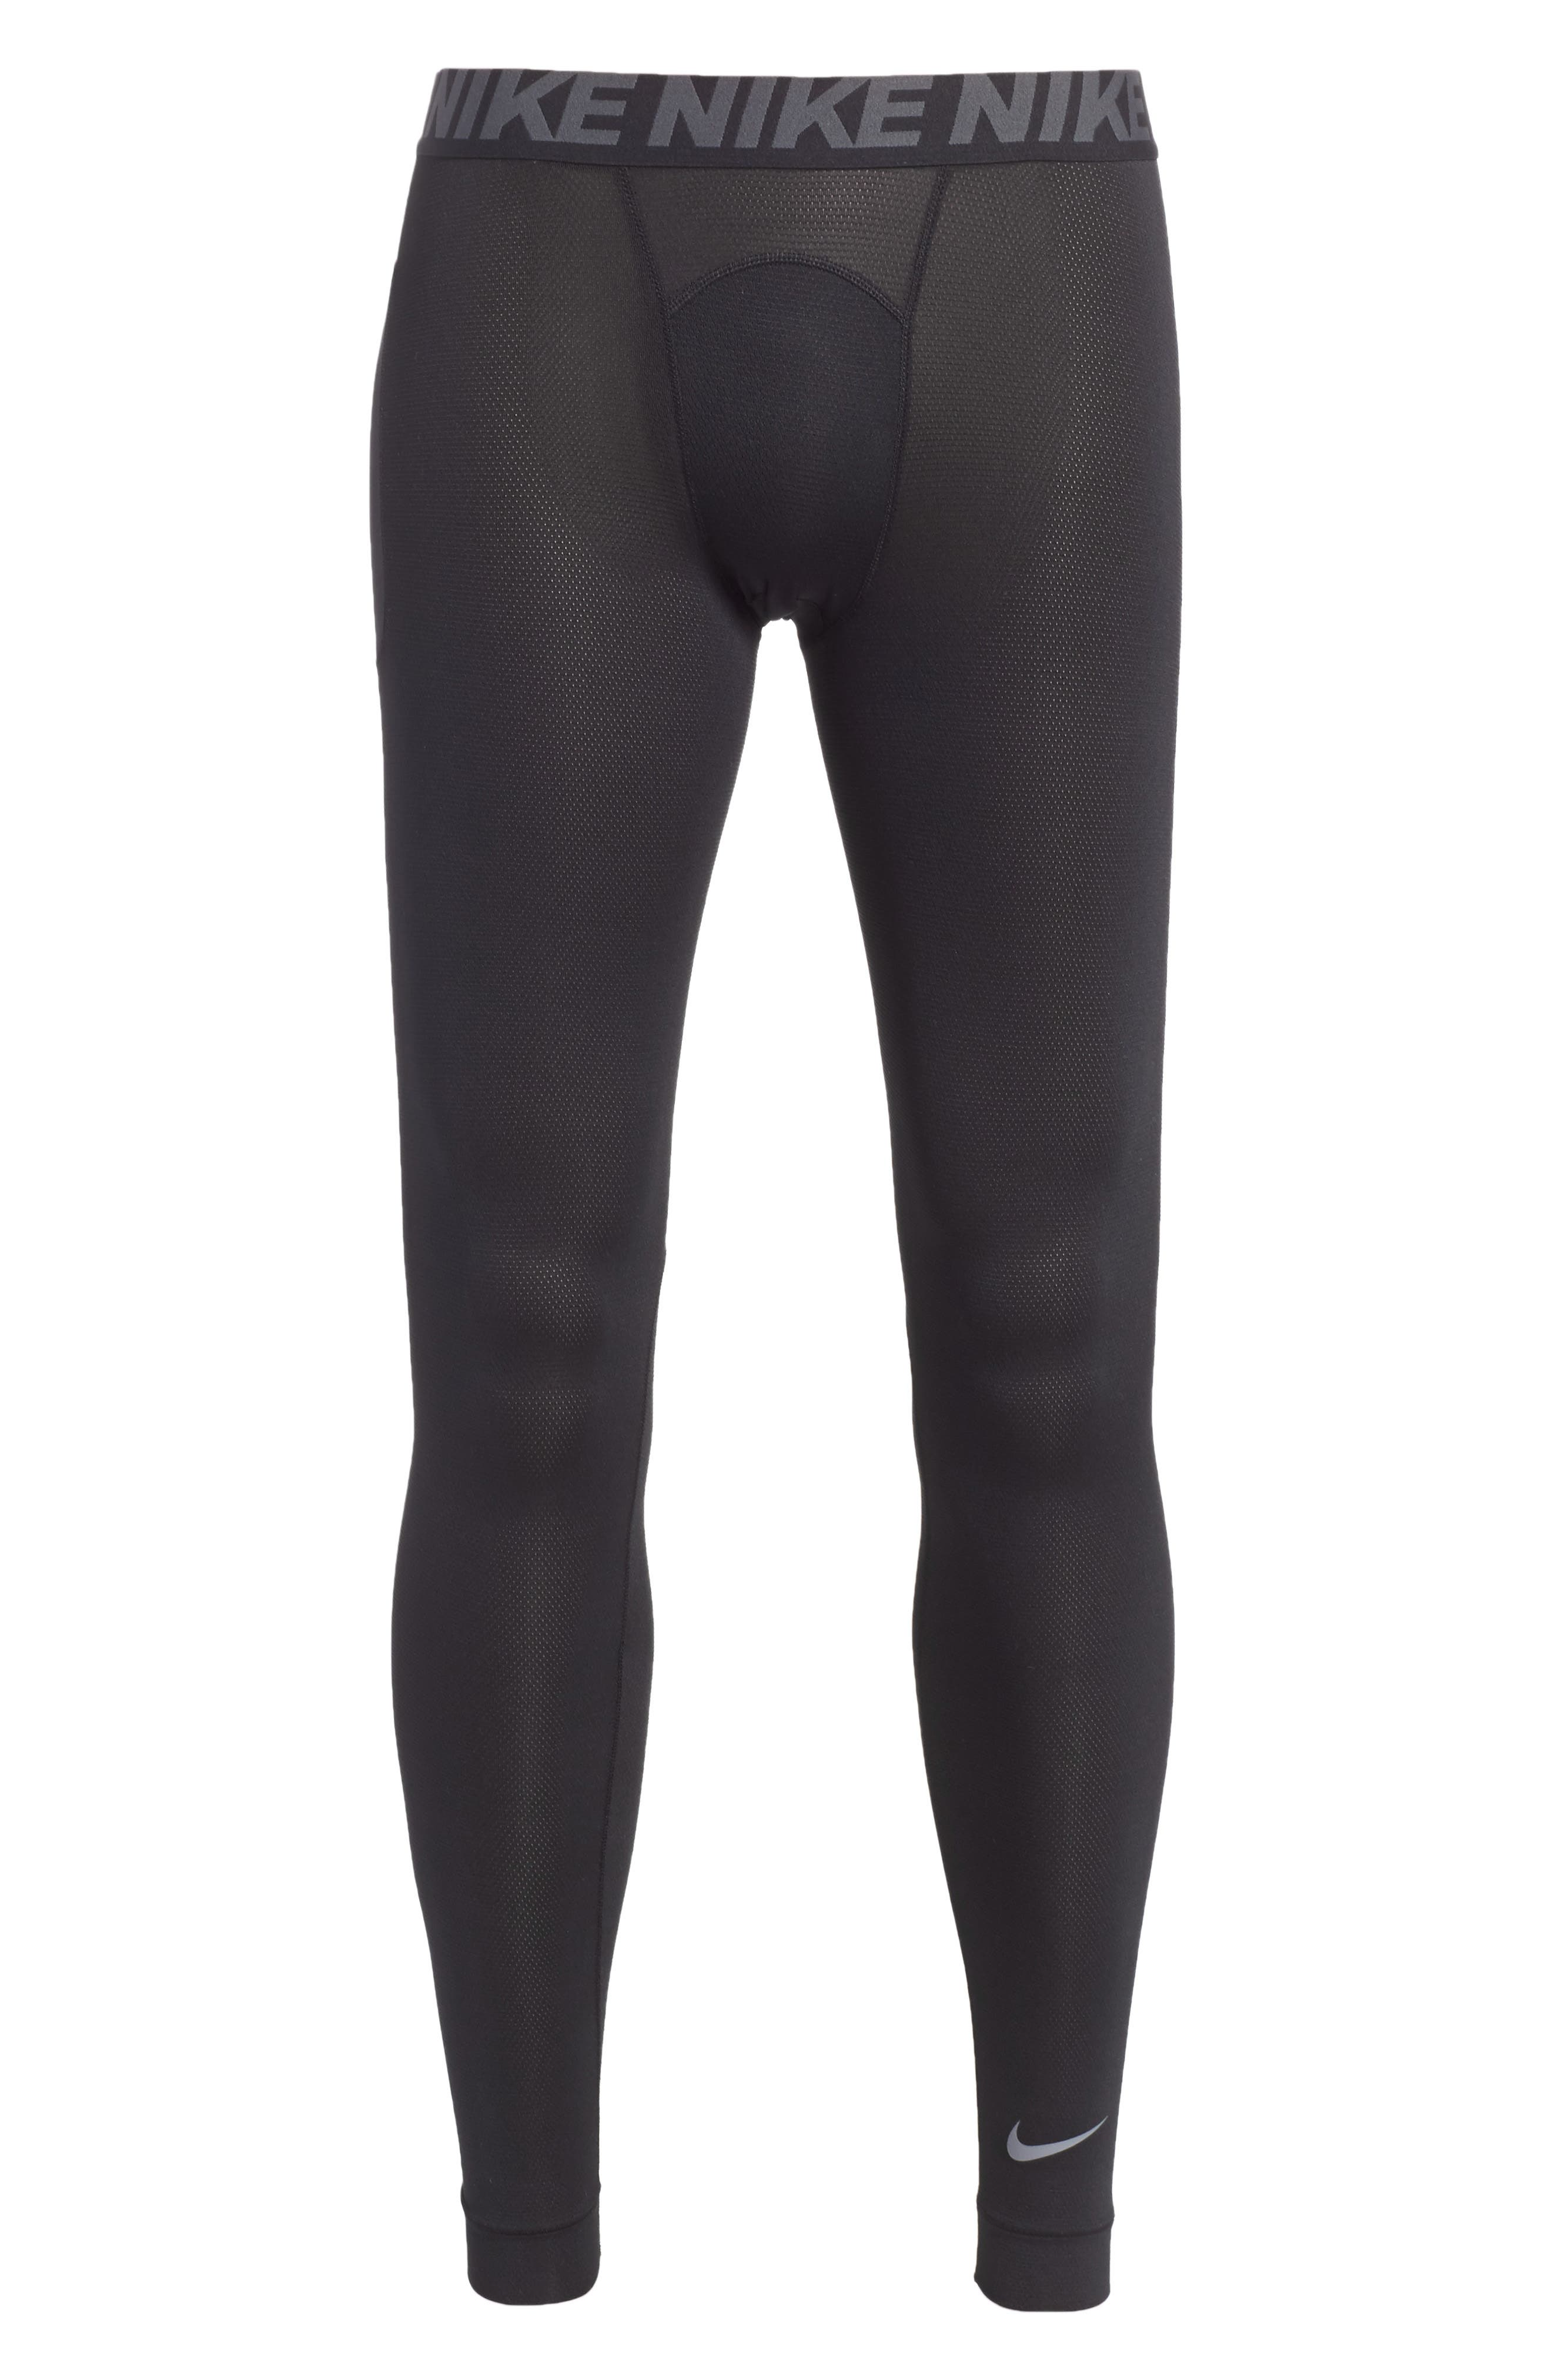 Pro Utility Tights,                         Main,                         color, Black/ Anthracite/ Dark Grey